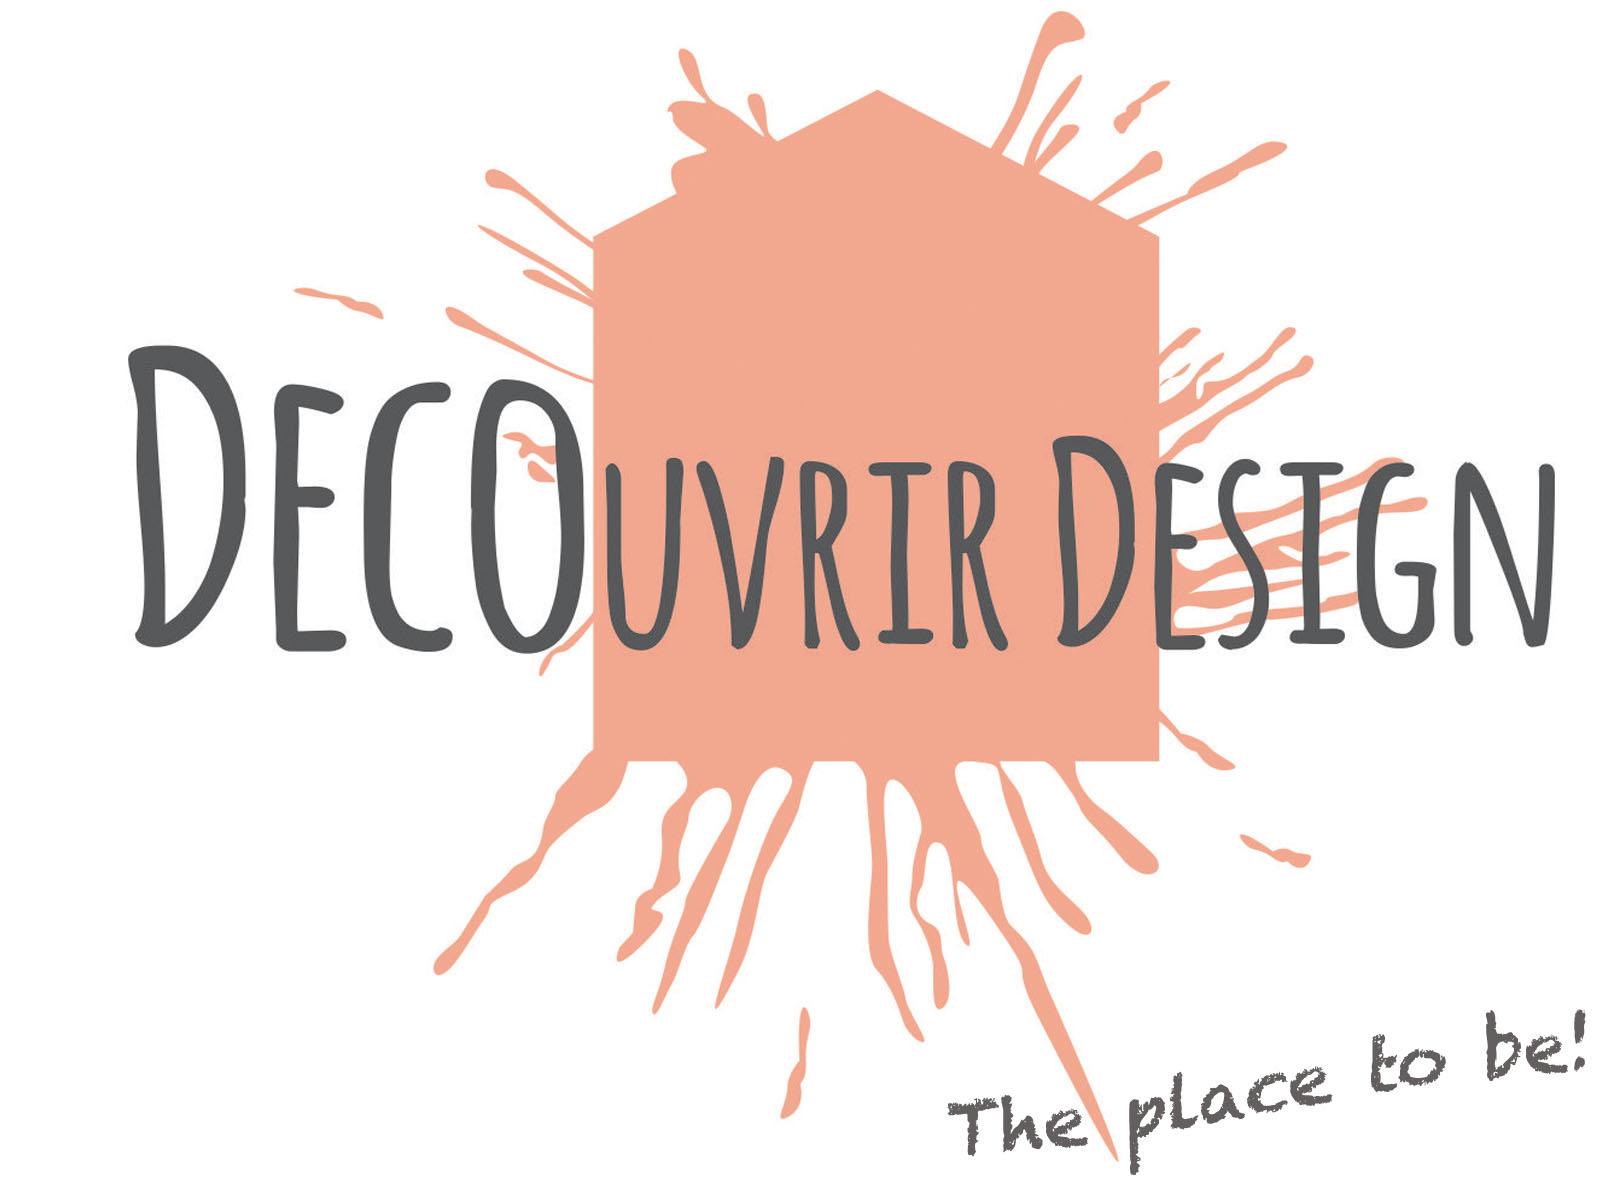 DecouvrirDesign